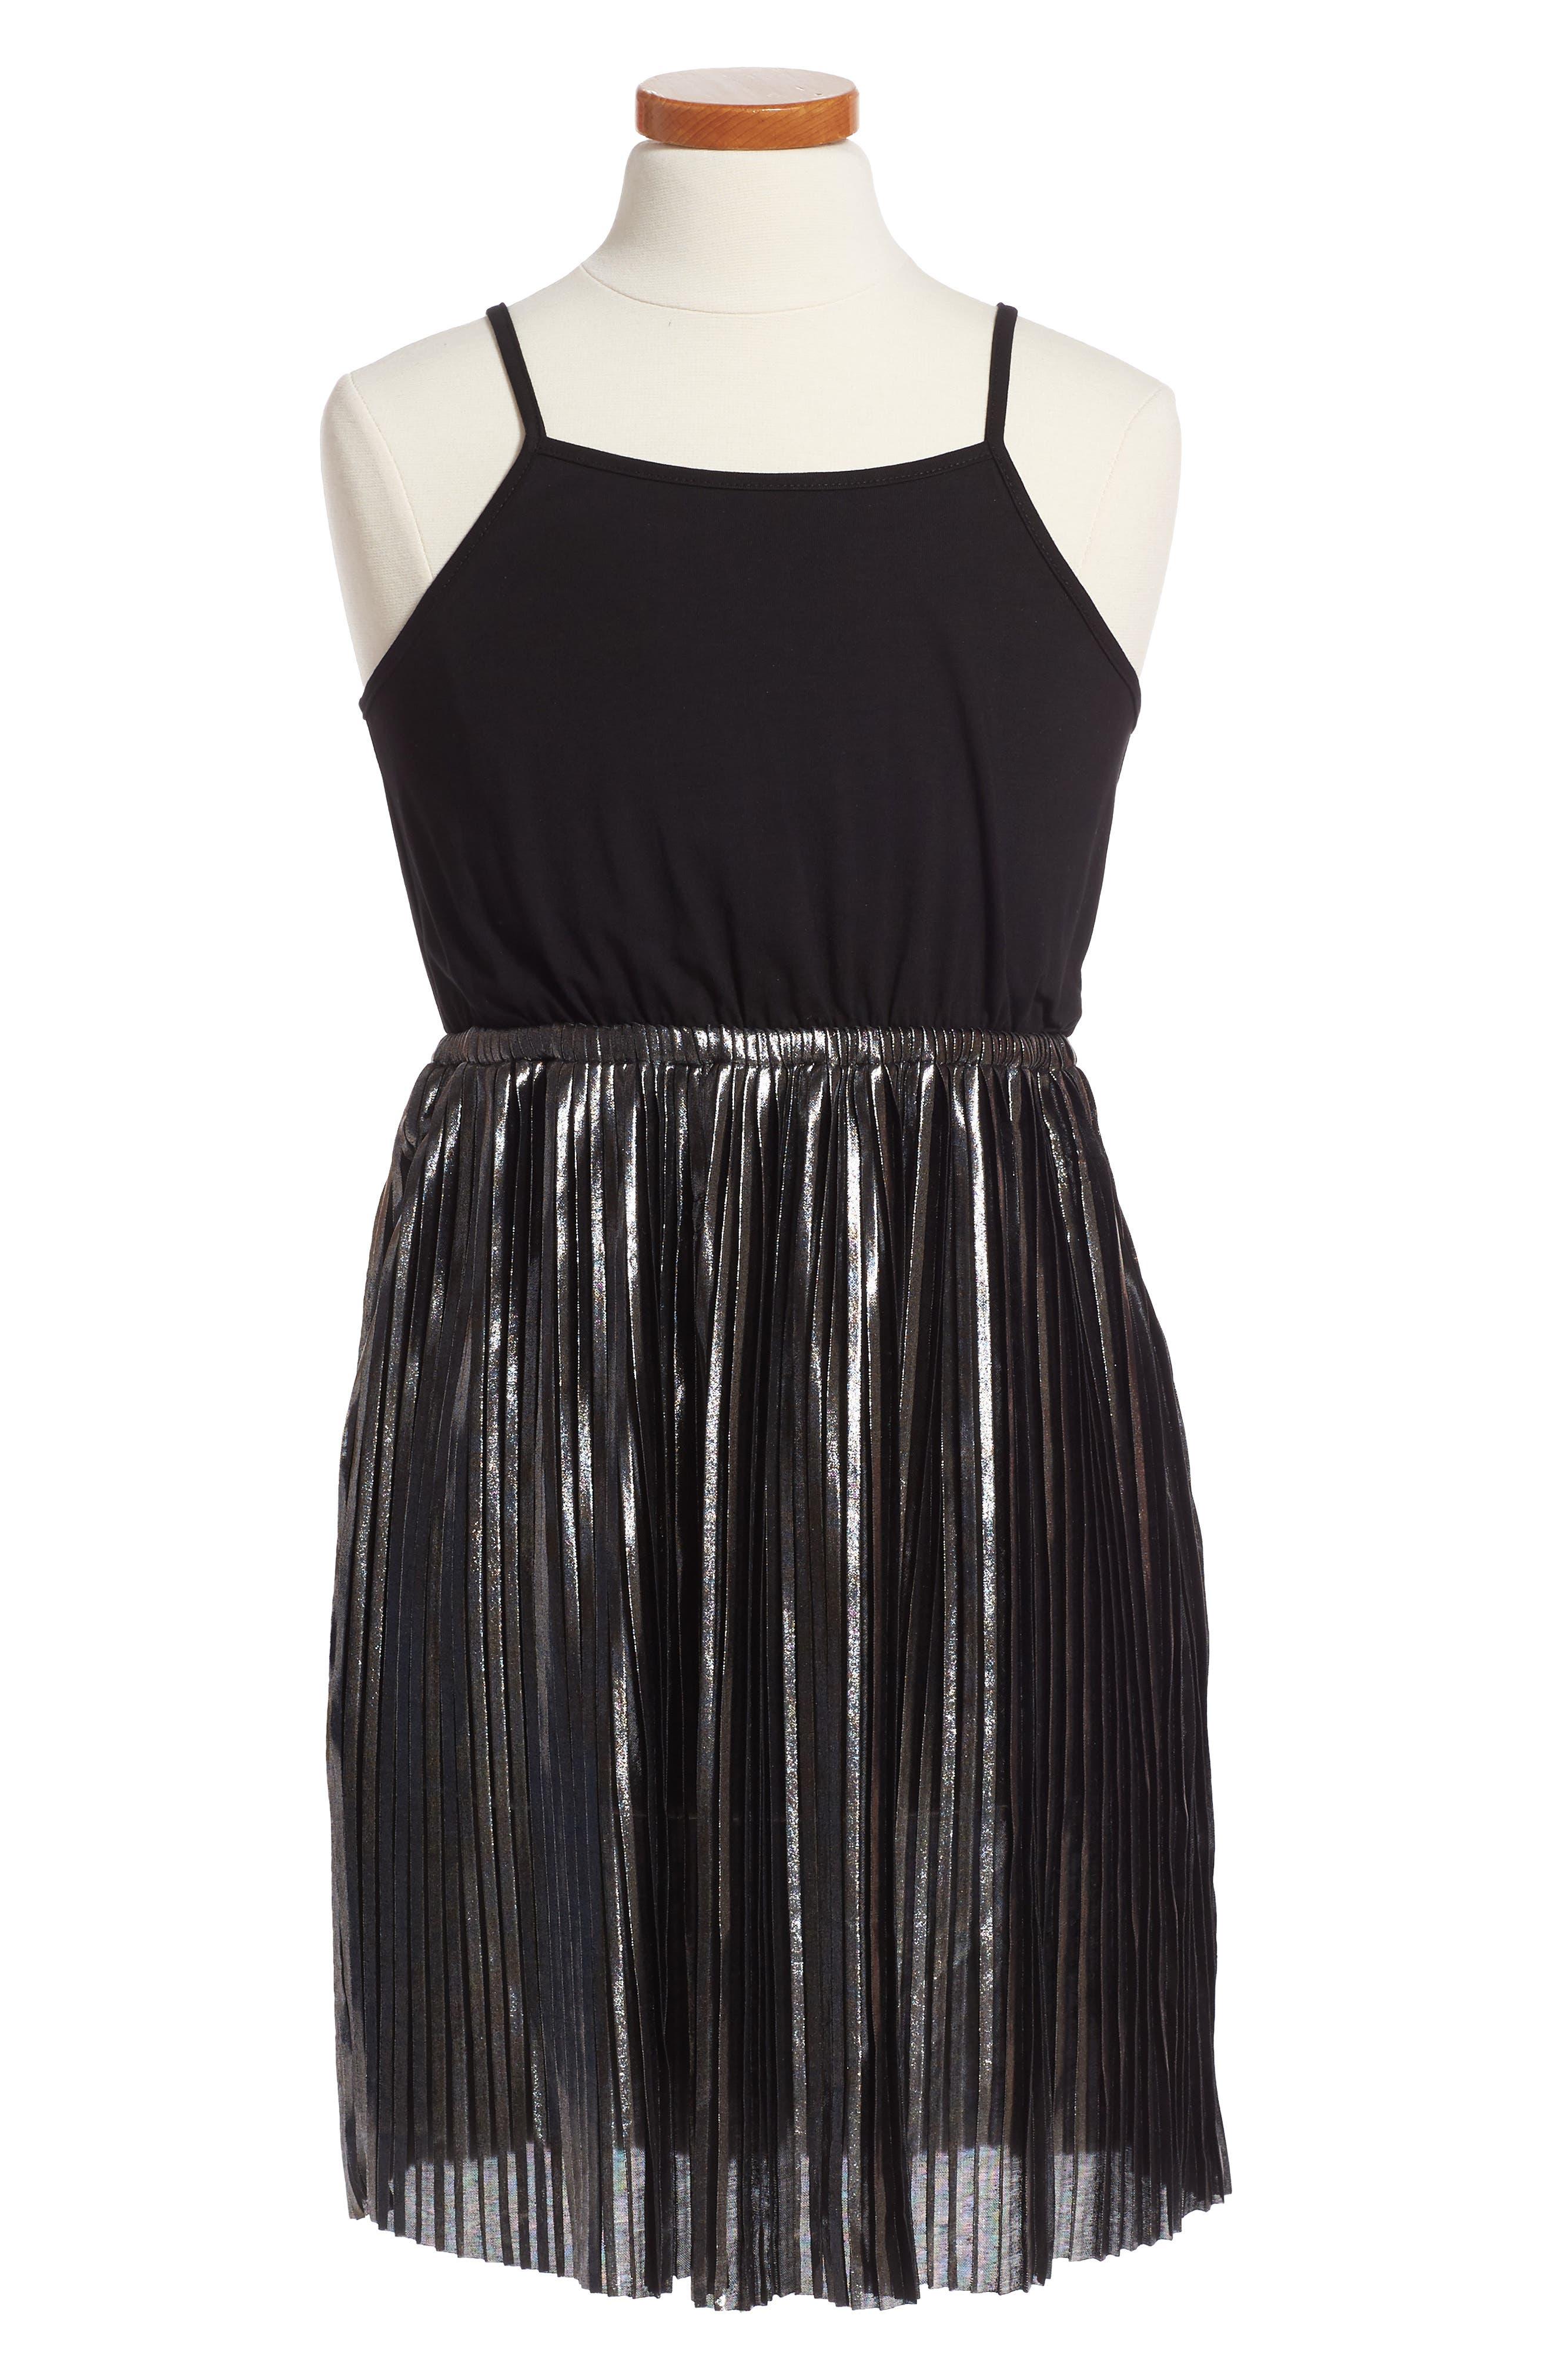 Alternate Image 1 Selected - Bardot Junior Metallic Sleeveless Dress (Big Girls)